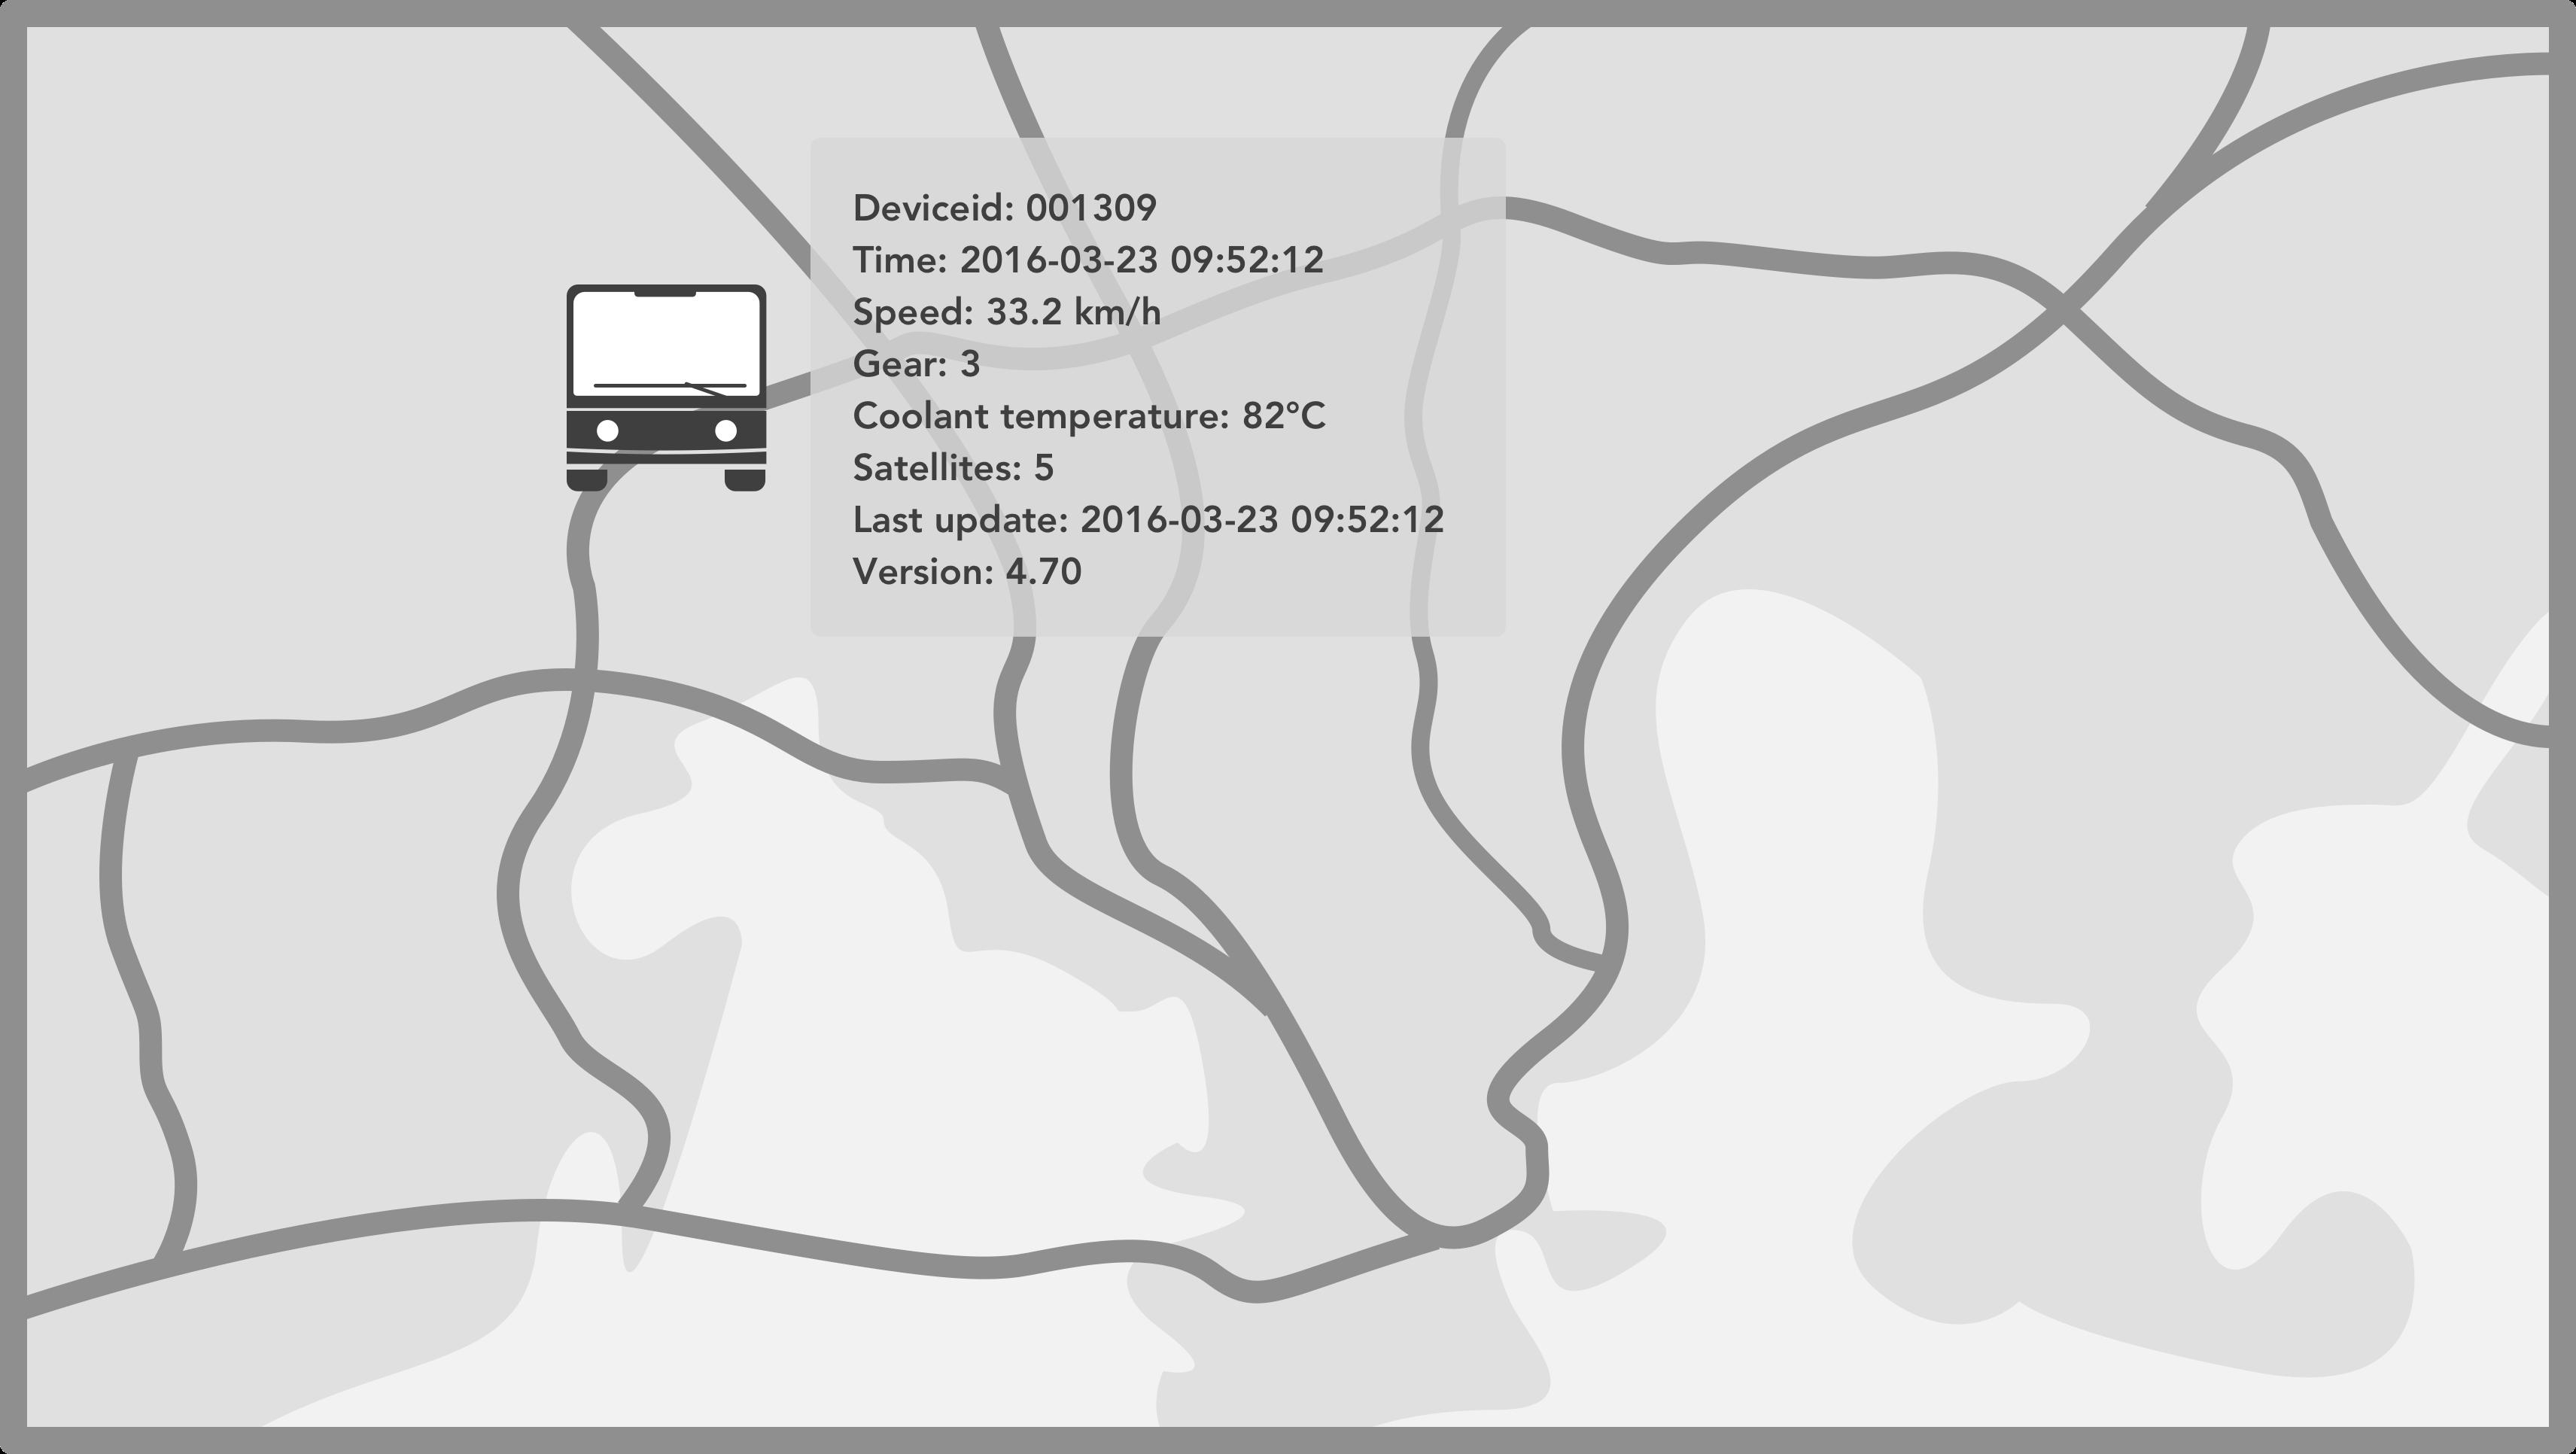 Bussi kartalla